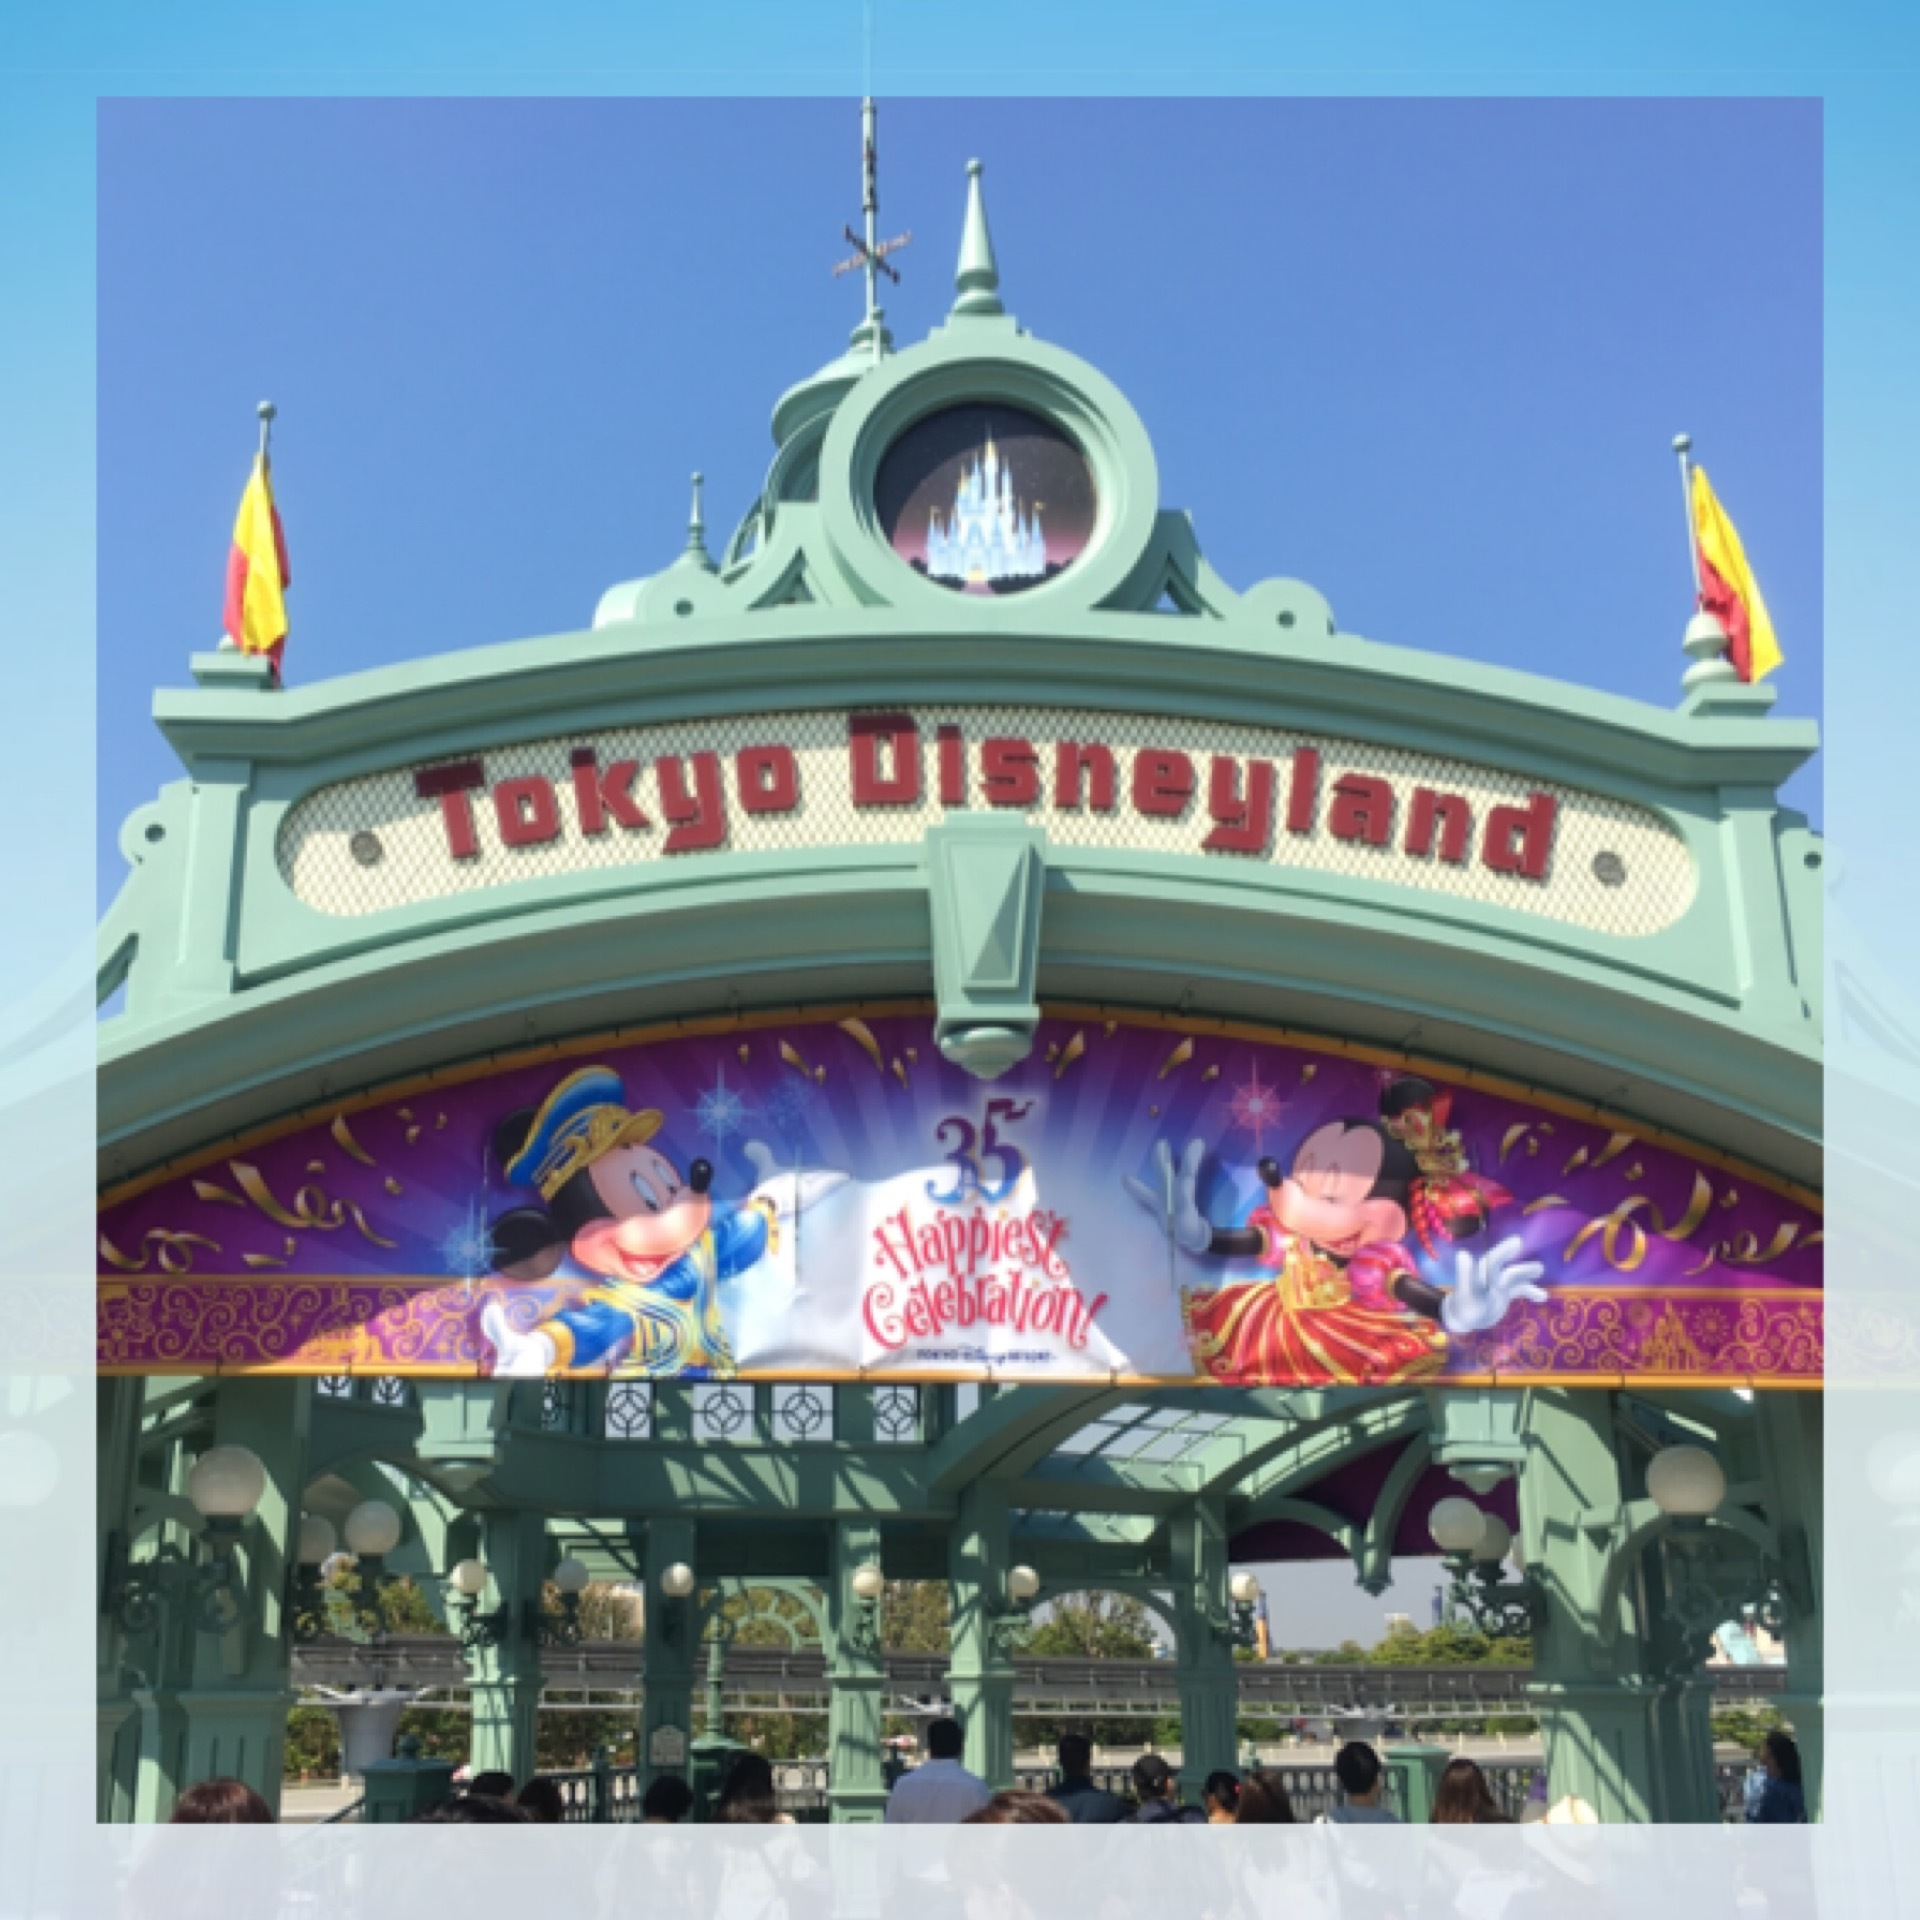 Tokyo Disneyland《 35 Happiest Gelebration! 》に行ってきました♫_1_2-2